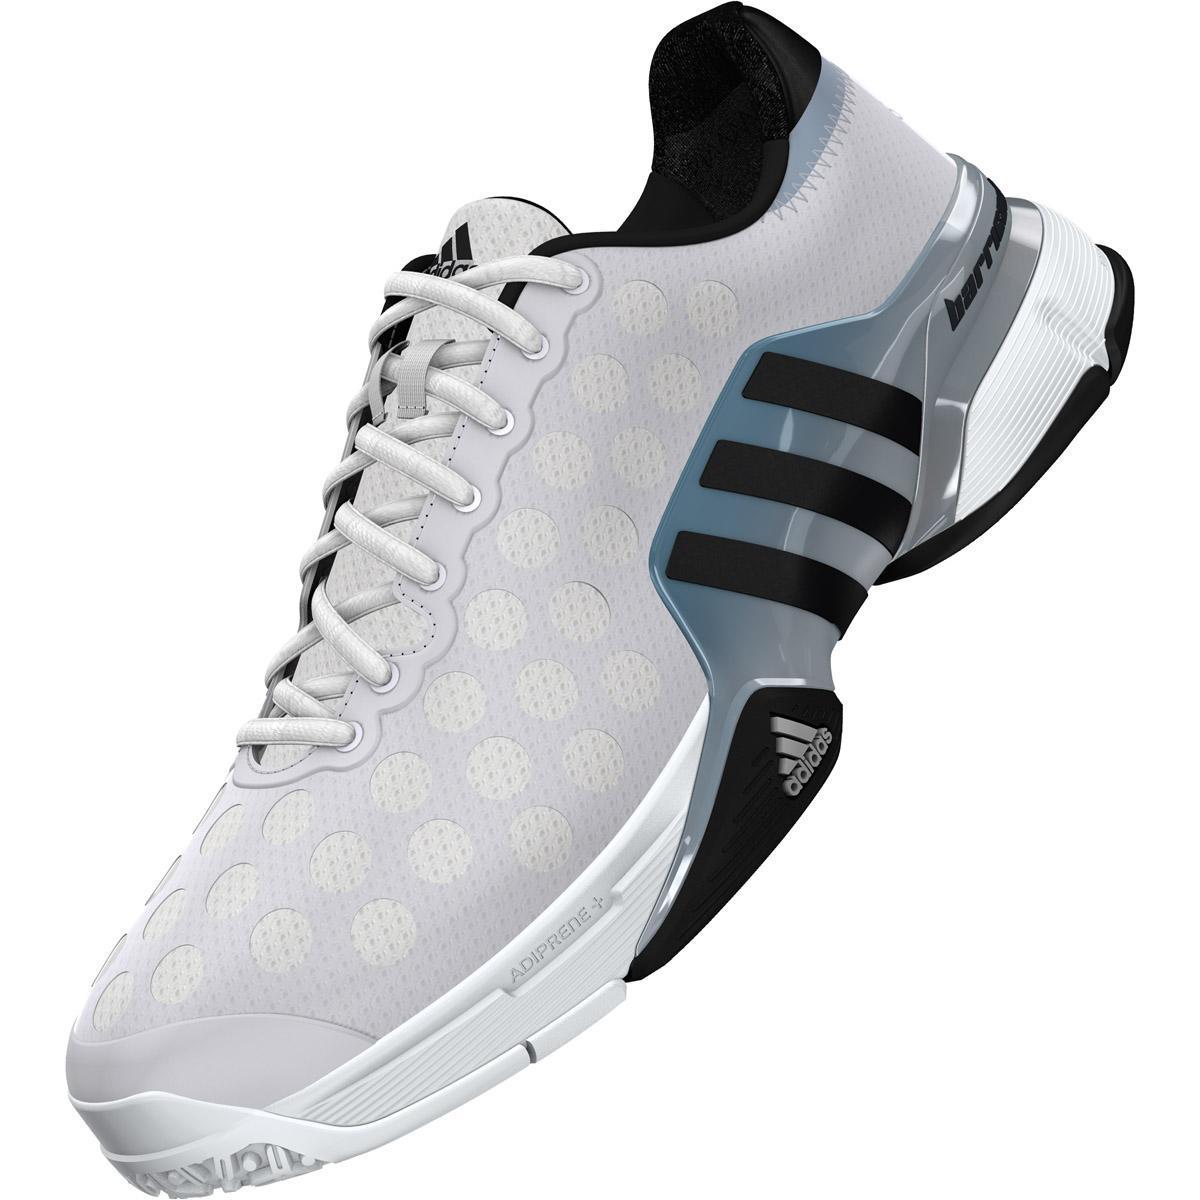 adidas mens barricade 2015 court tennis shoes white